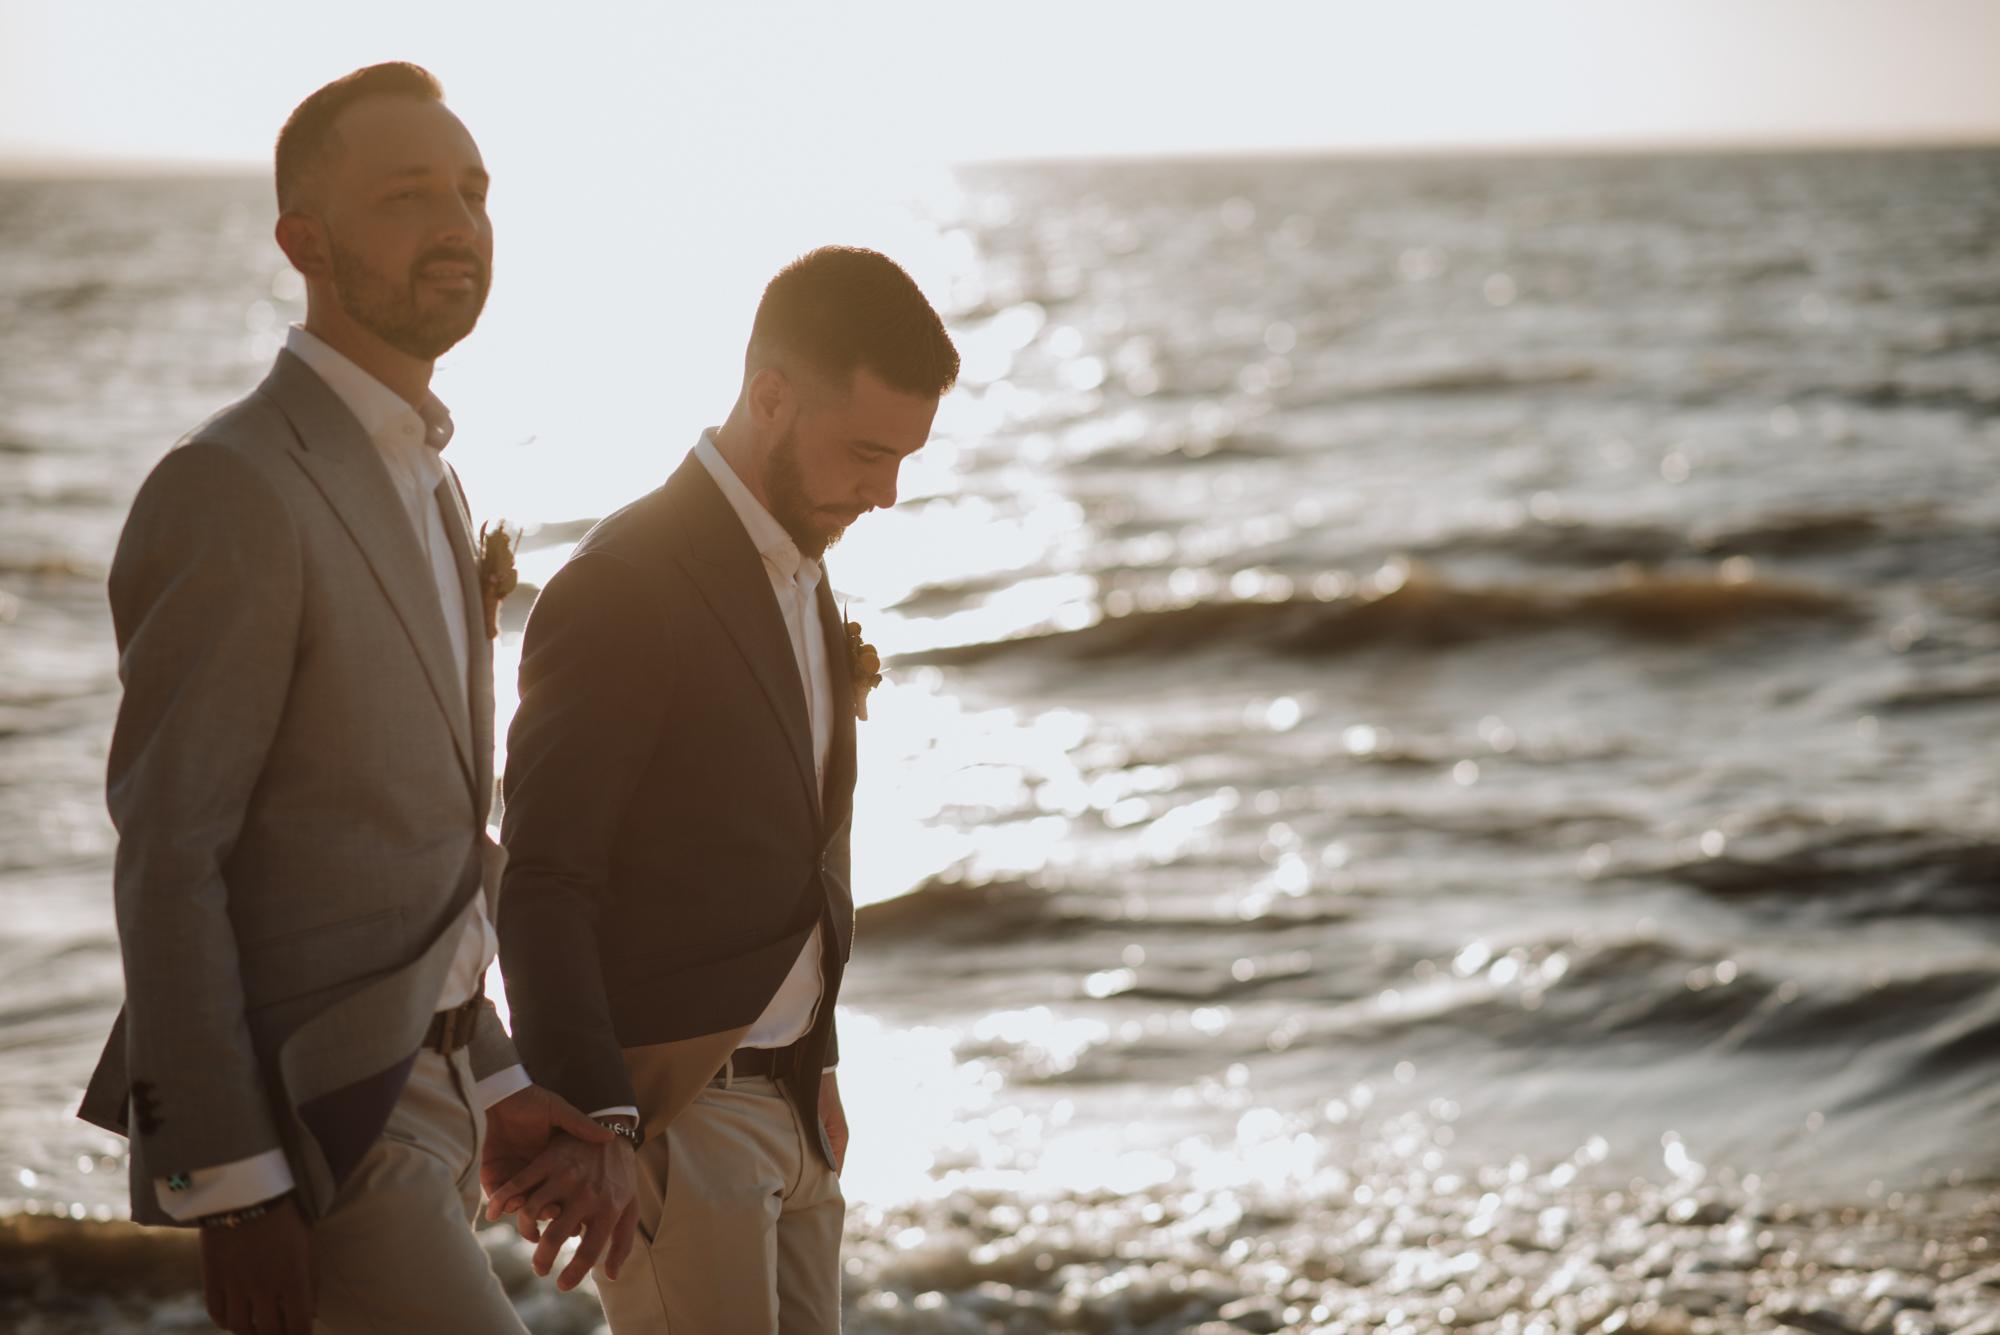 jessica-howard-photography-sean-alessandro-wedding-day-web-346.jpg